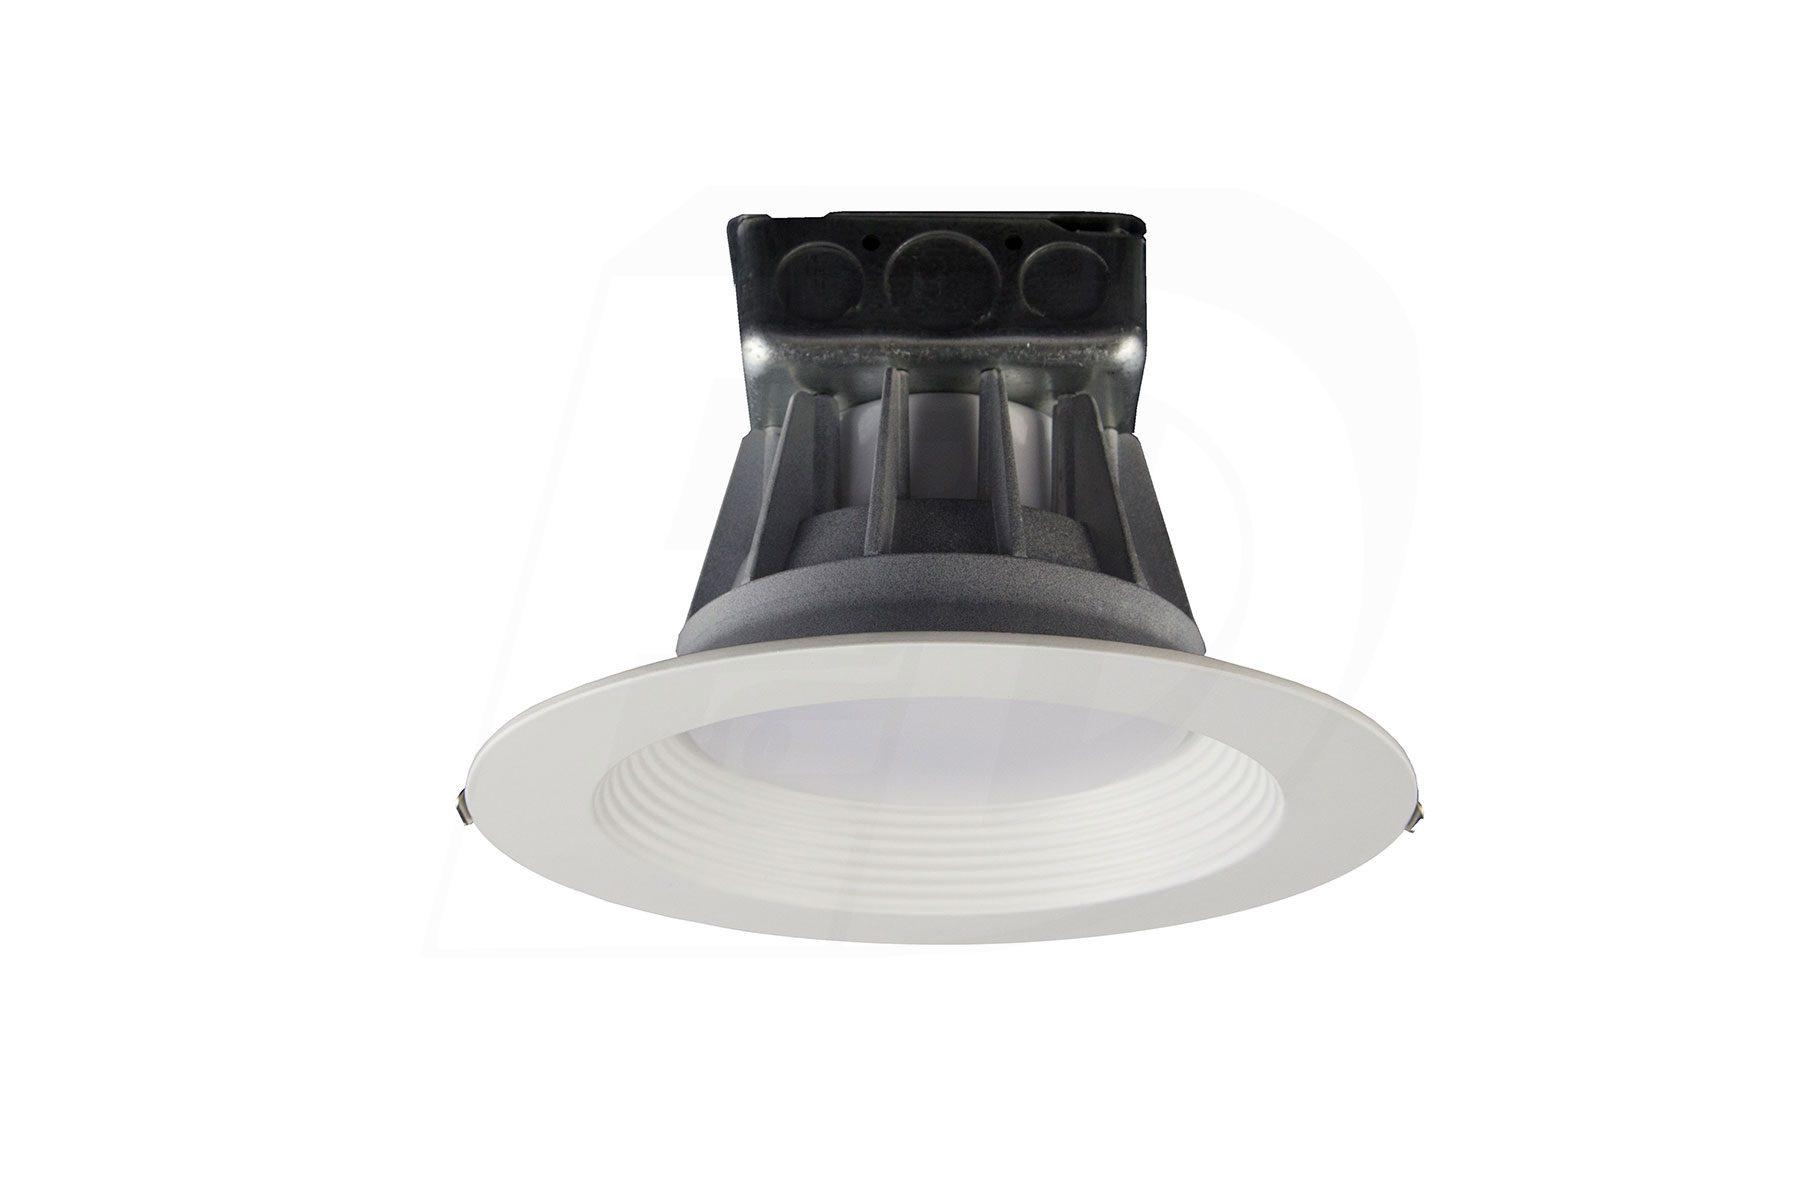 8 Inch. Round Integrated LED Retrofit Recessed Lighting